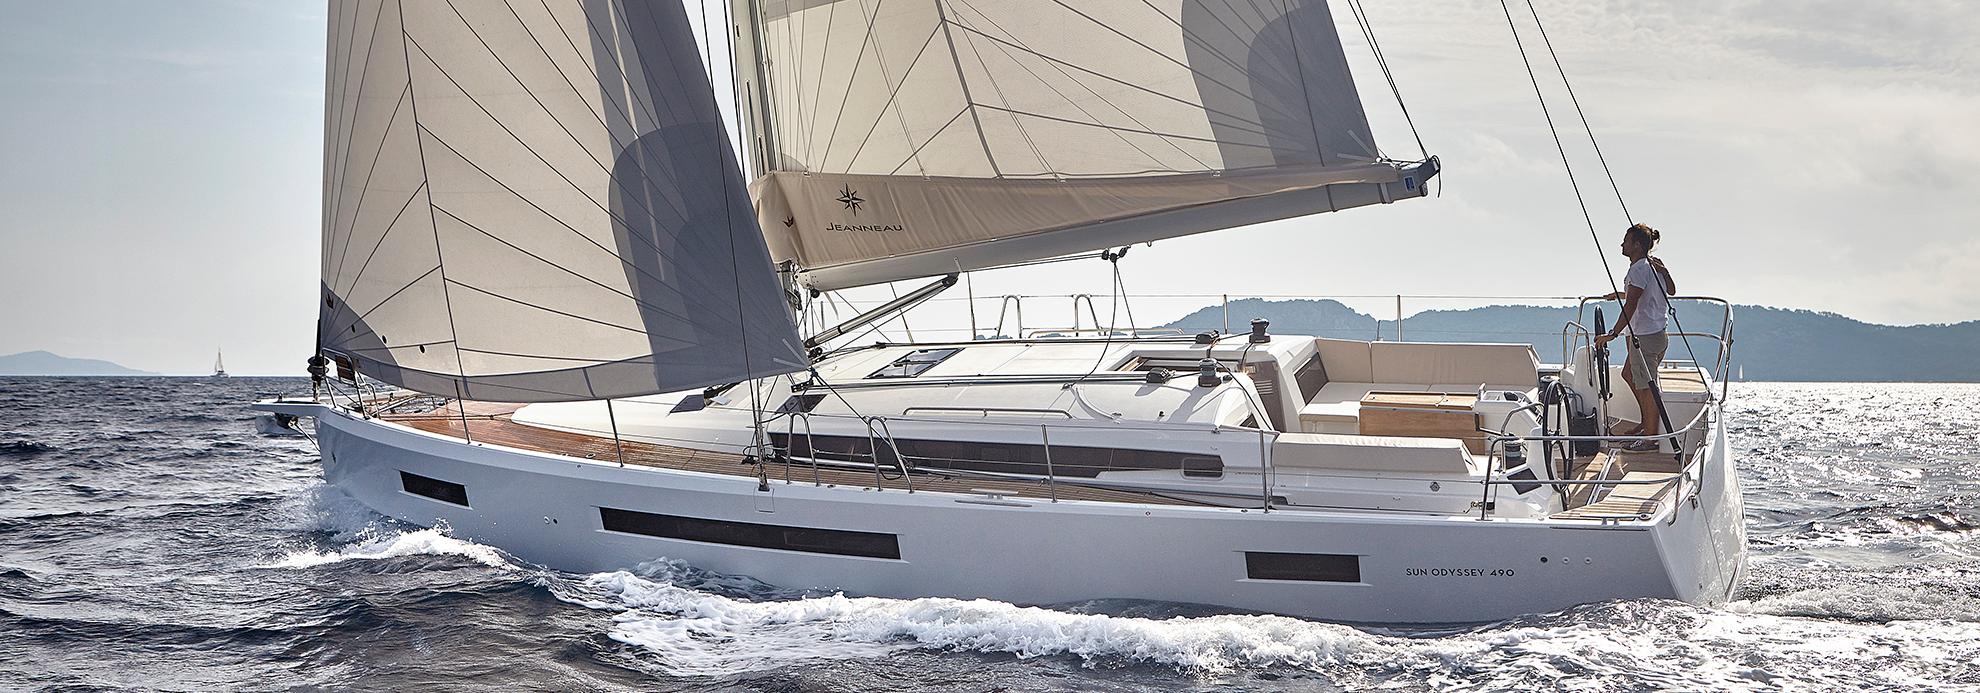 Jeanneau sun odyssey 410 - Riverside Marina & Yacht Sales